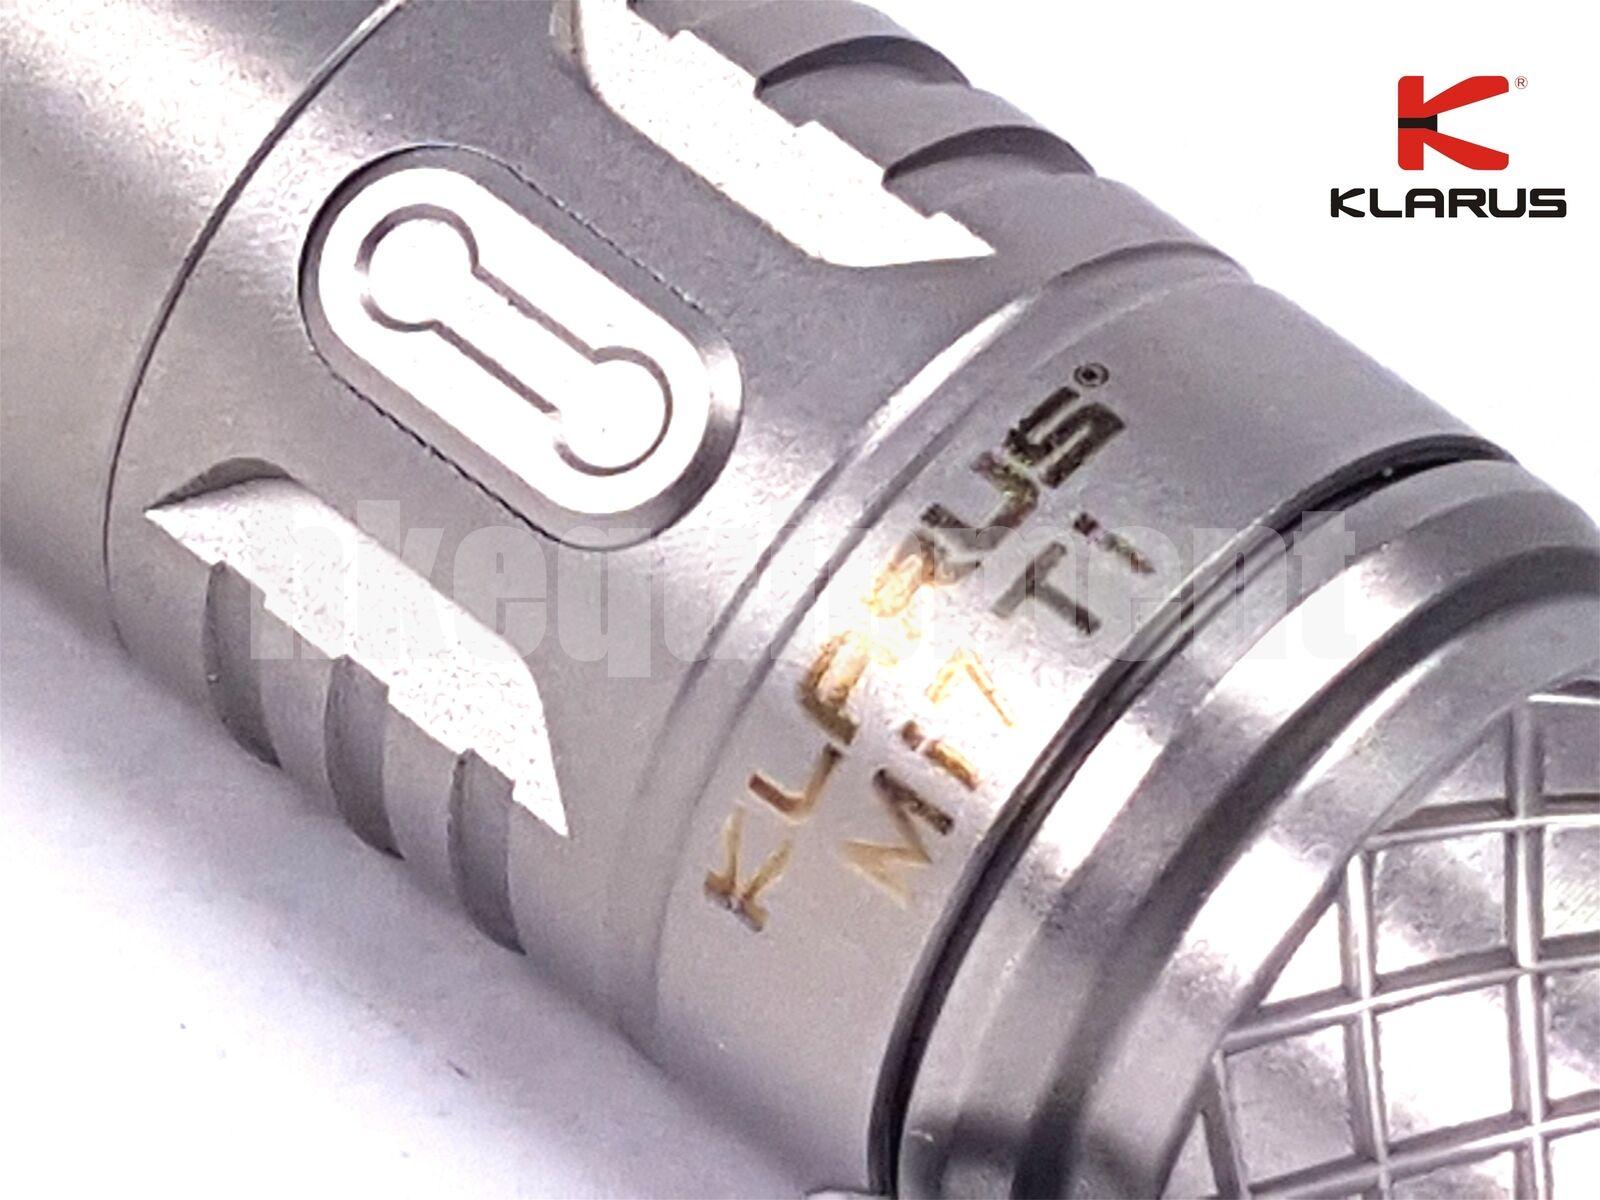 Klarus Mi7 Ti Titanium Cree XP-L HI V3 LED AA 14500 Torch